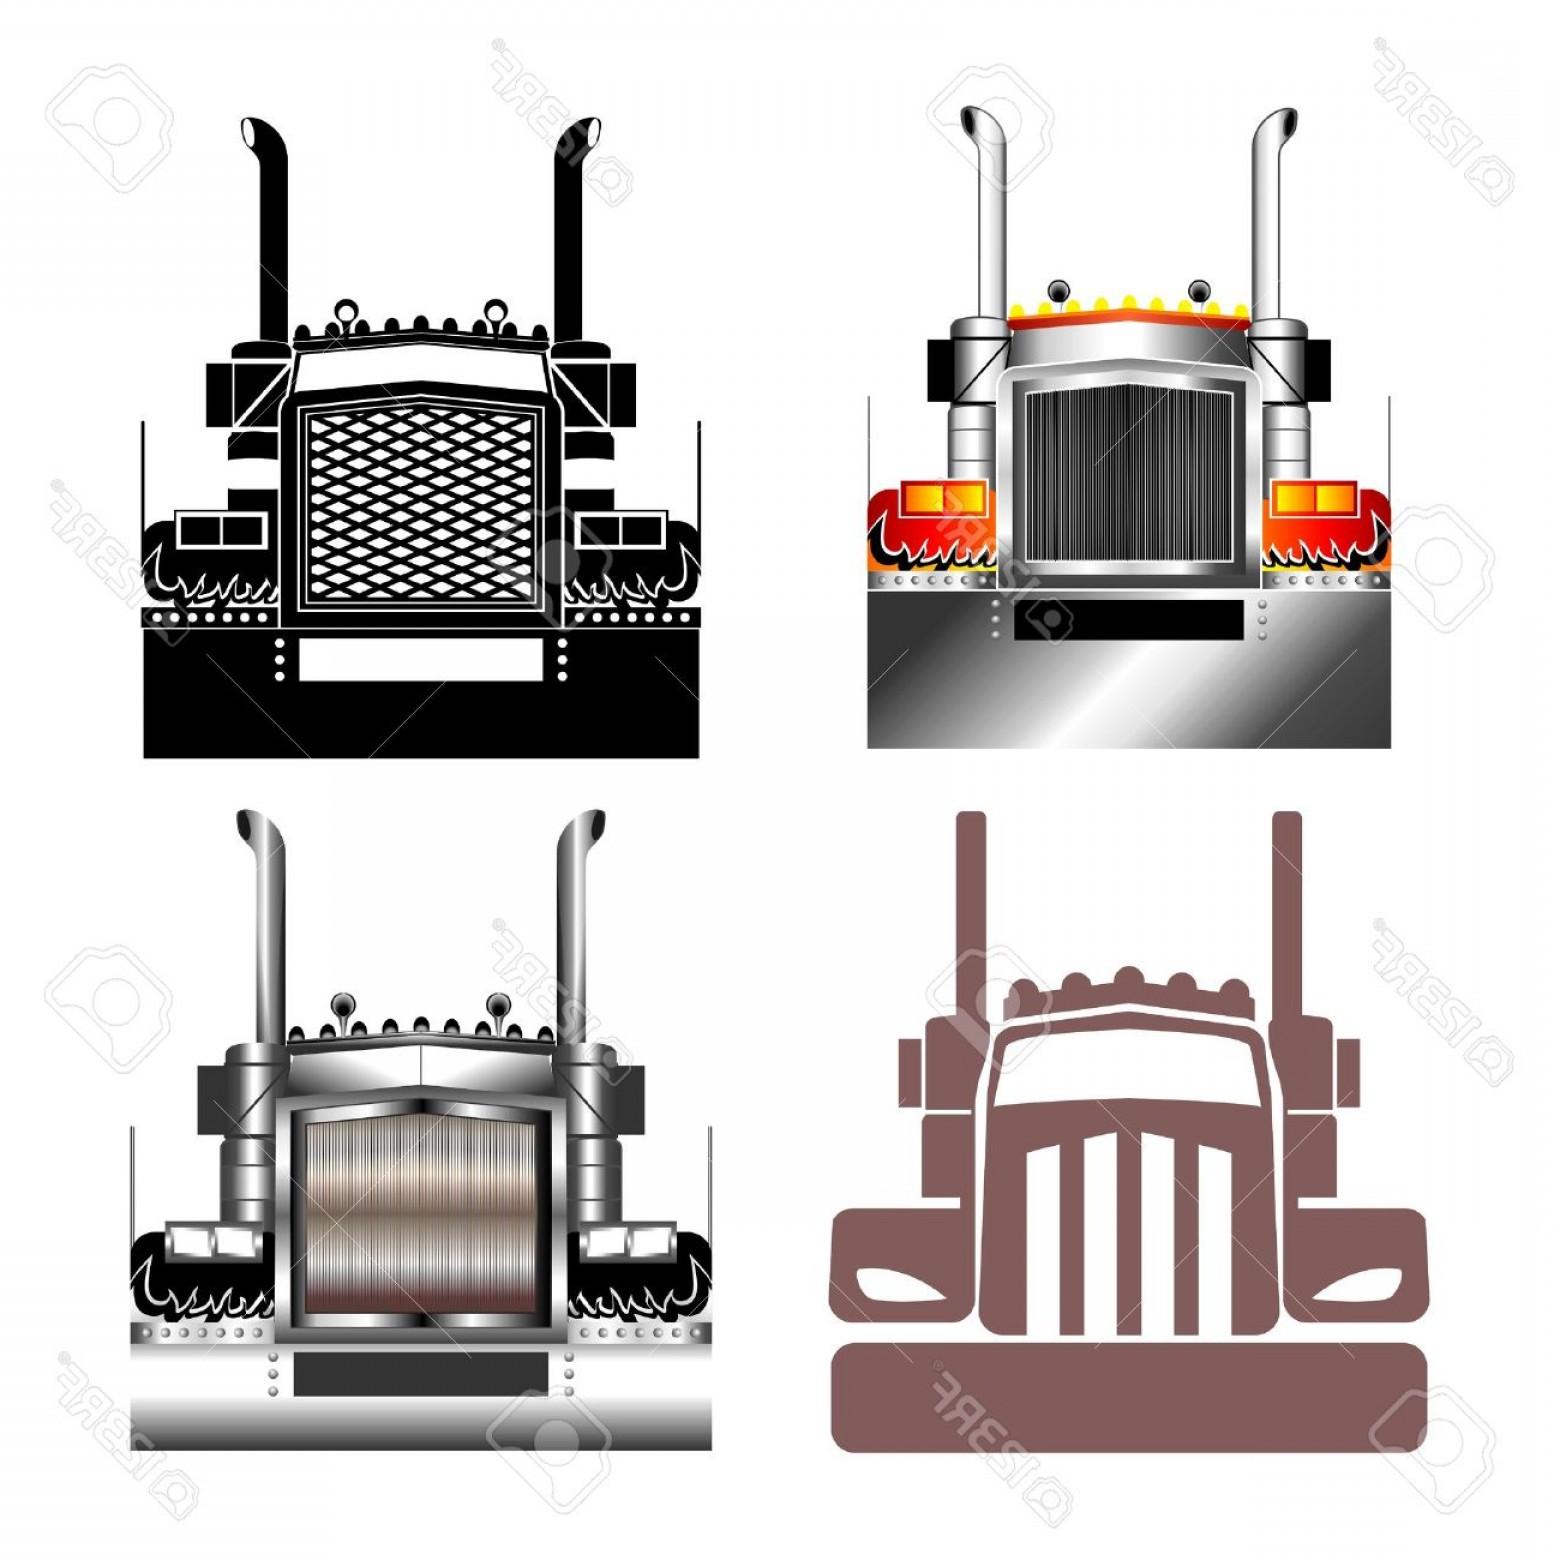 Semi truck grill clipart banner transparent library Fronts Semi Trucks Vector Clip Art | Savoyuptown banner transparent library